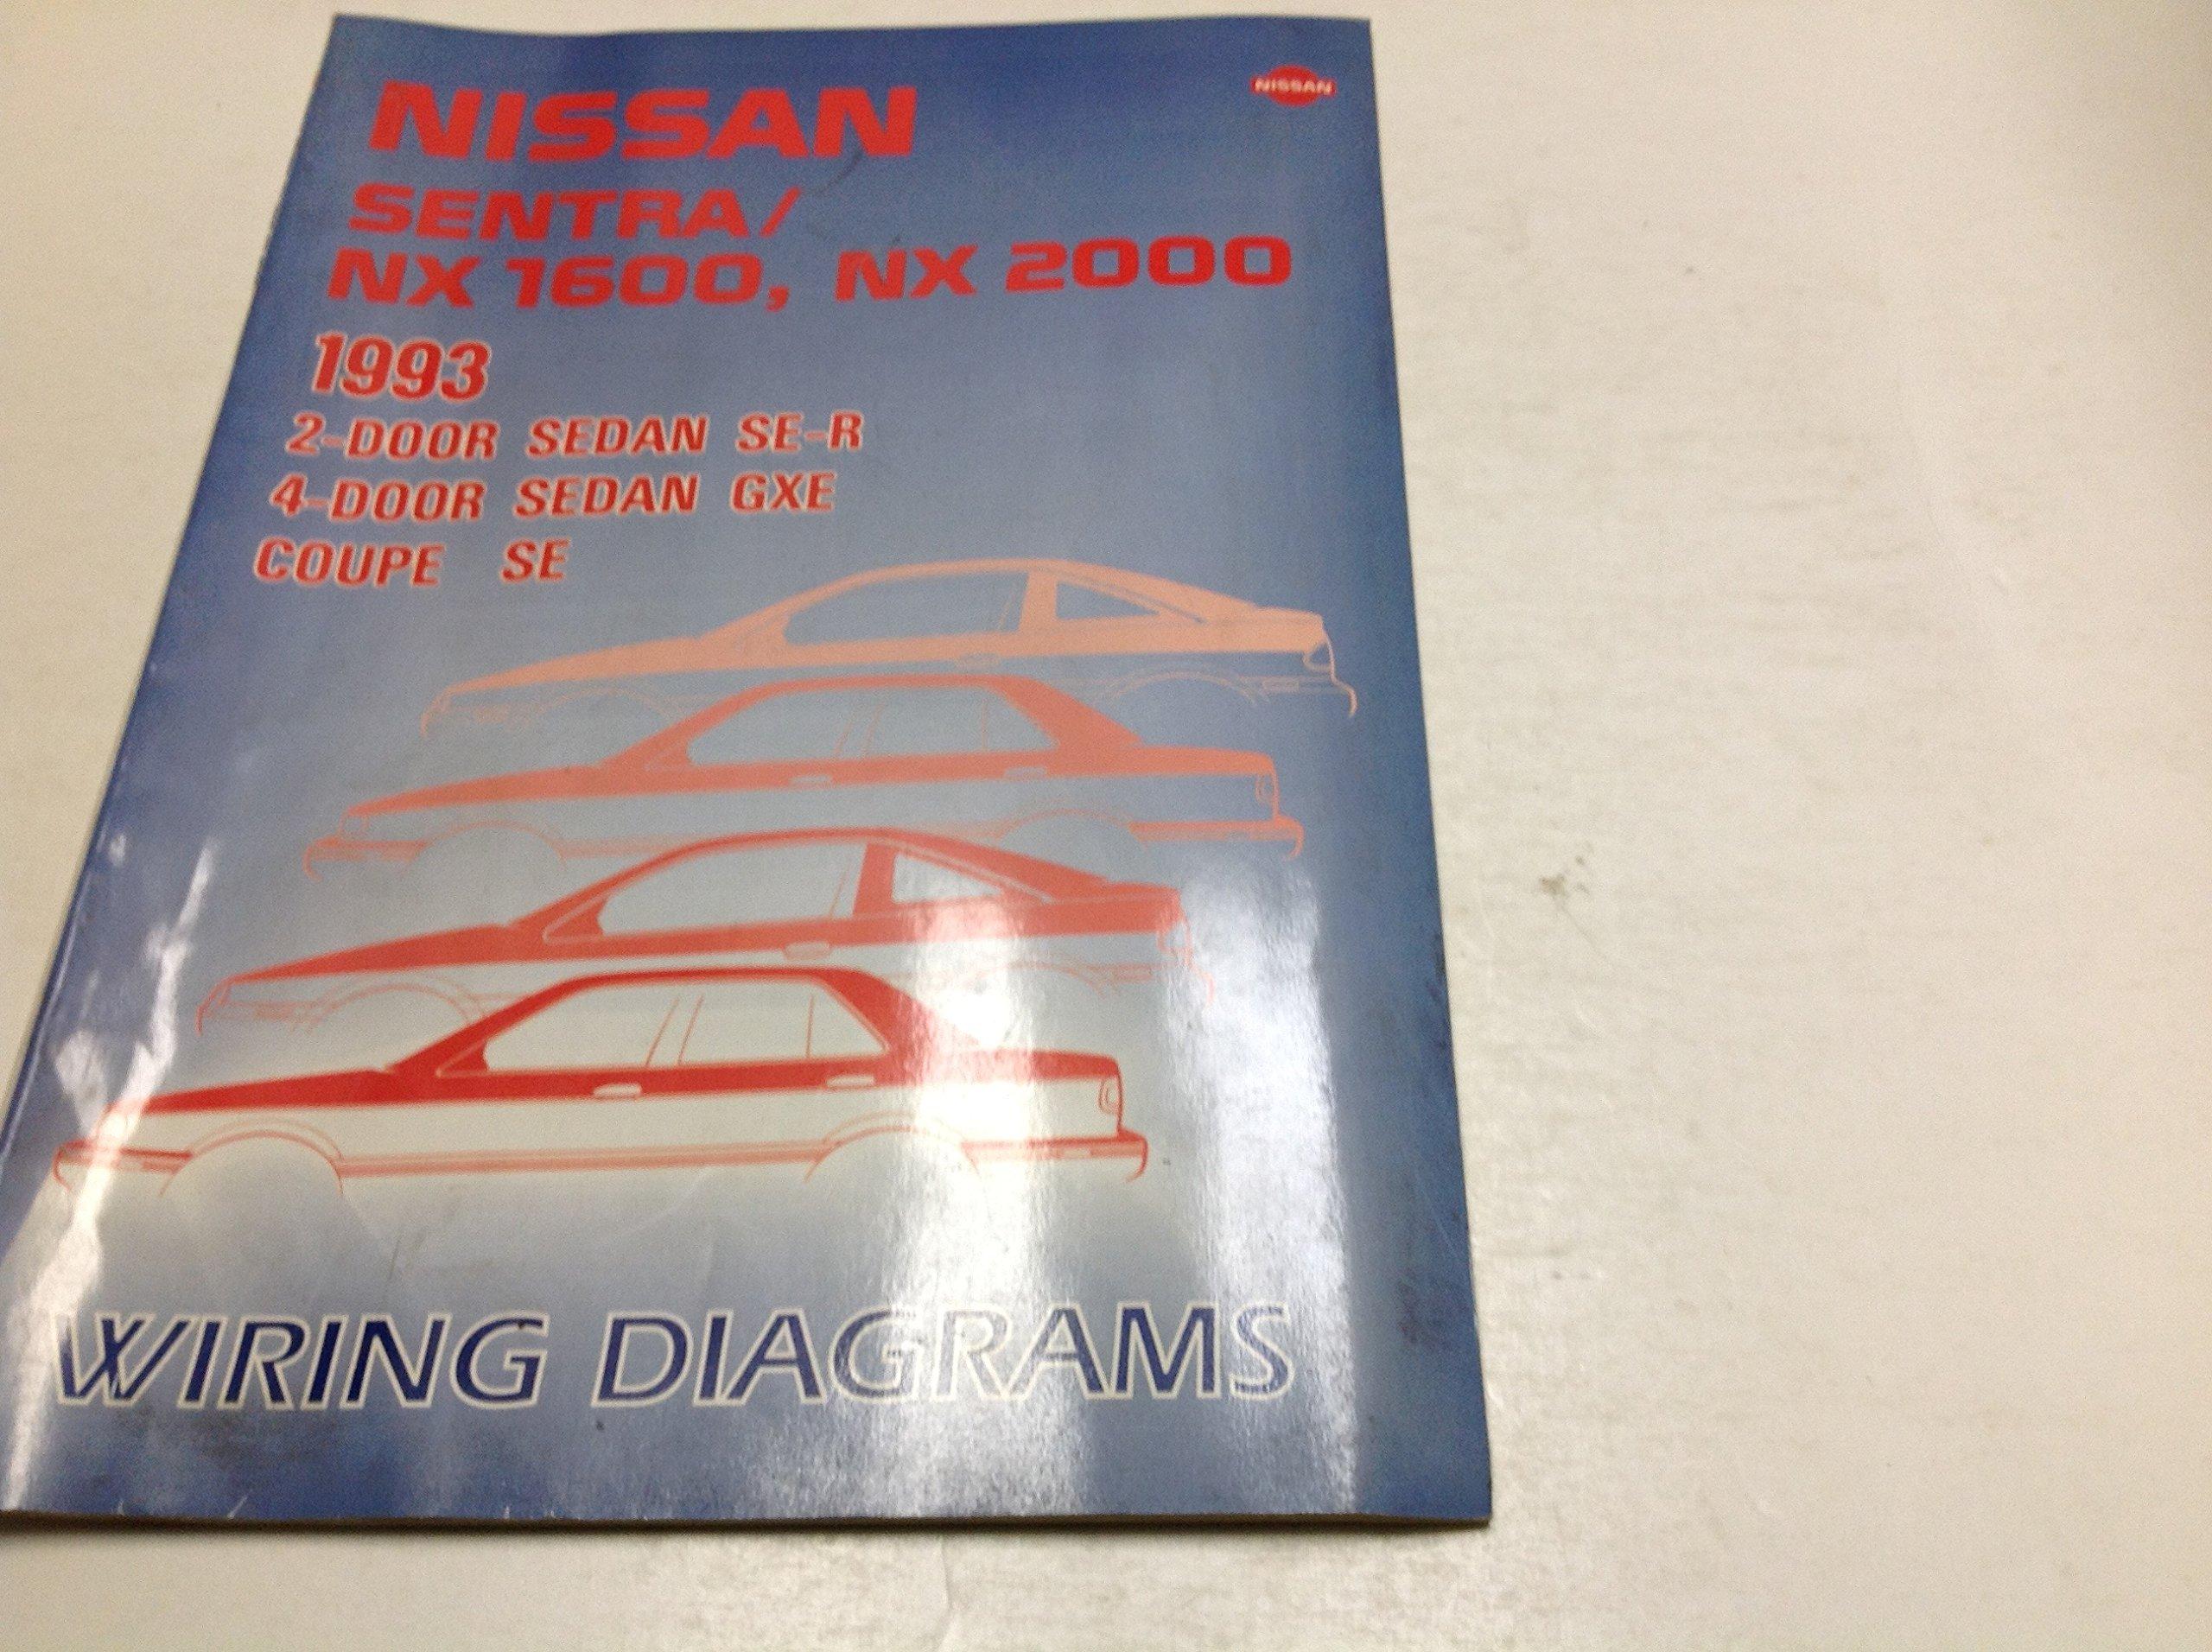 1993 Nissan Sentra NX 1600 2000 Electrical Wiring Digram ... on 91 ford explorer wiring diagram, 91 dodge stealth wiring diagram, 91 ford thunderbird wiring diagram, 91 chevy camaro wiring diagram, 91 ford f150 wiring diagram, 91 jeep cherokee wiring diagram, 91 acura integra wiring diagram, 91 dodge dakota wiring diagram, 91 chevy s10 wiring diagram, 91 jeep wrangler wiring diagram, 91 ford ranger wiring diagram, 91 toyota pickup wiring diagram, 91 geo tracker wiring diagram,